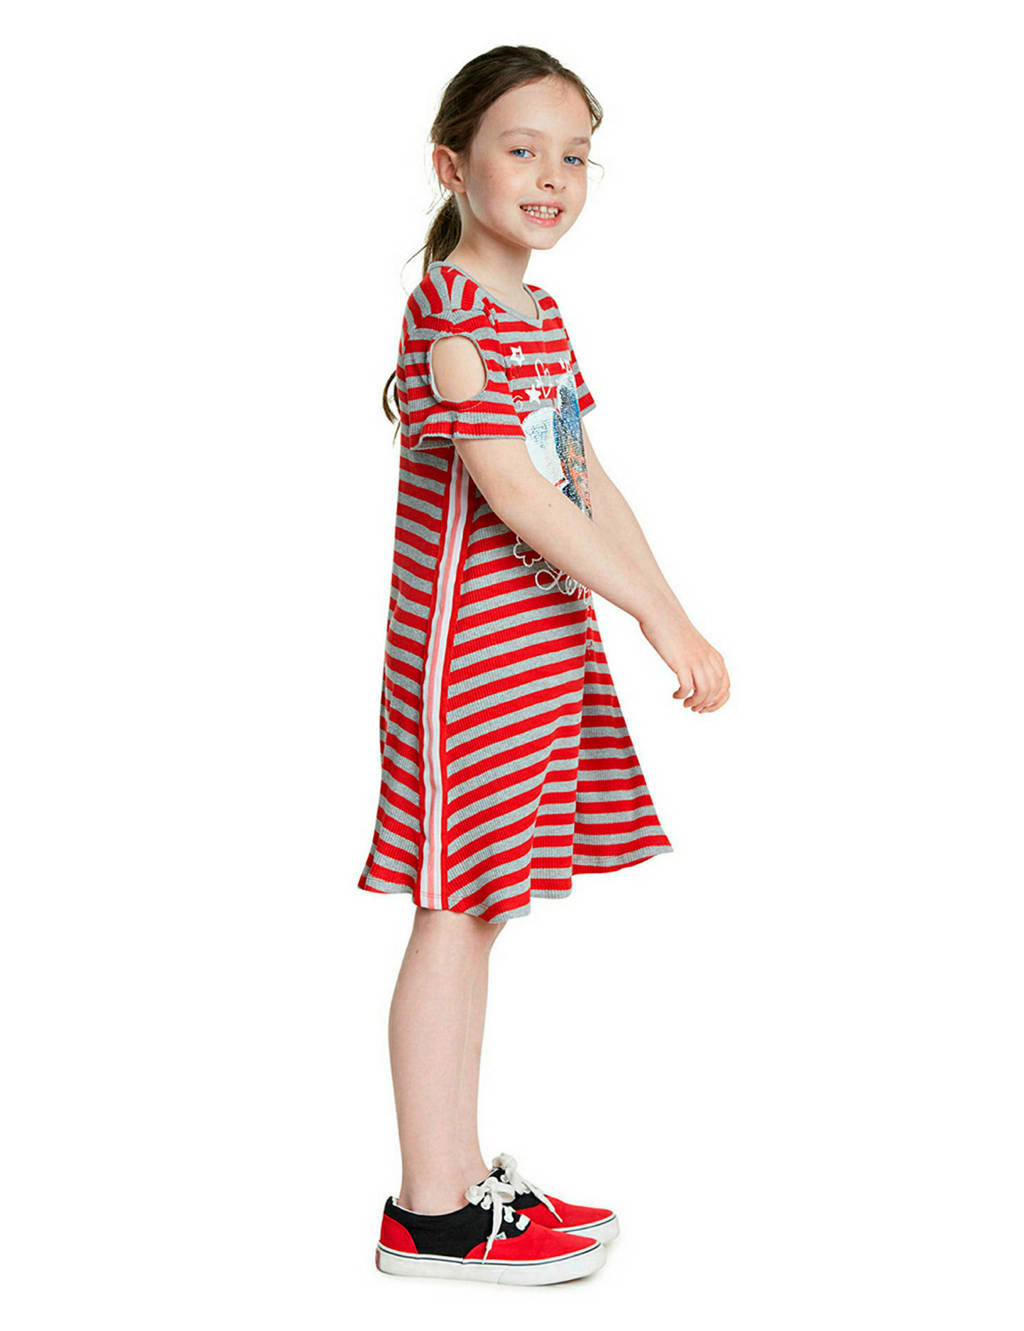 Desigual gestreepte open shoulder jurk met pailletten rood/beige/wit, Rood/beige/wit